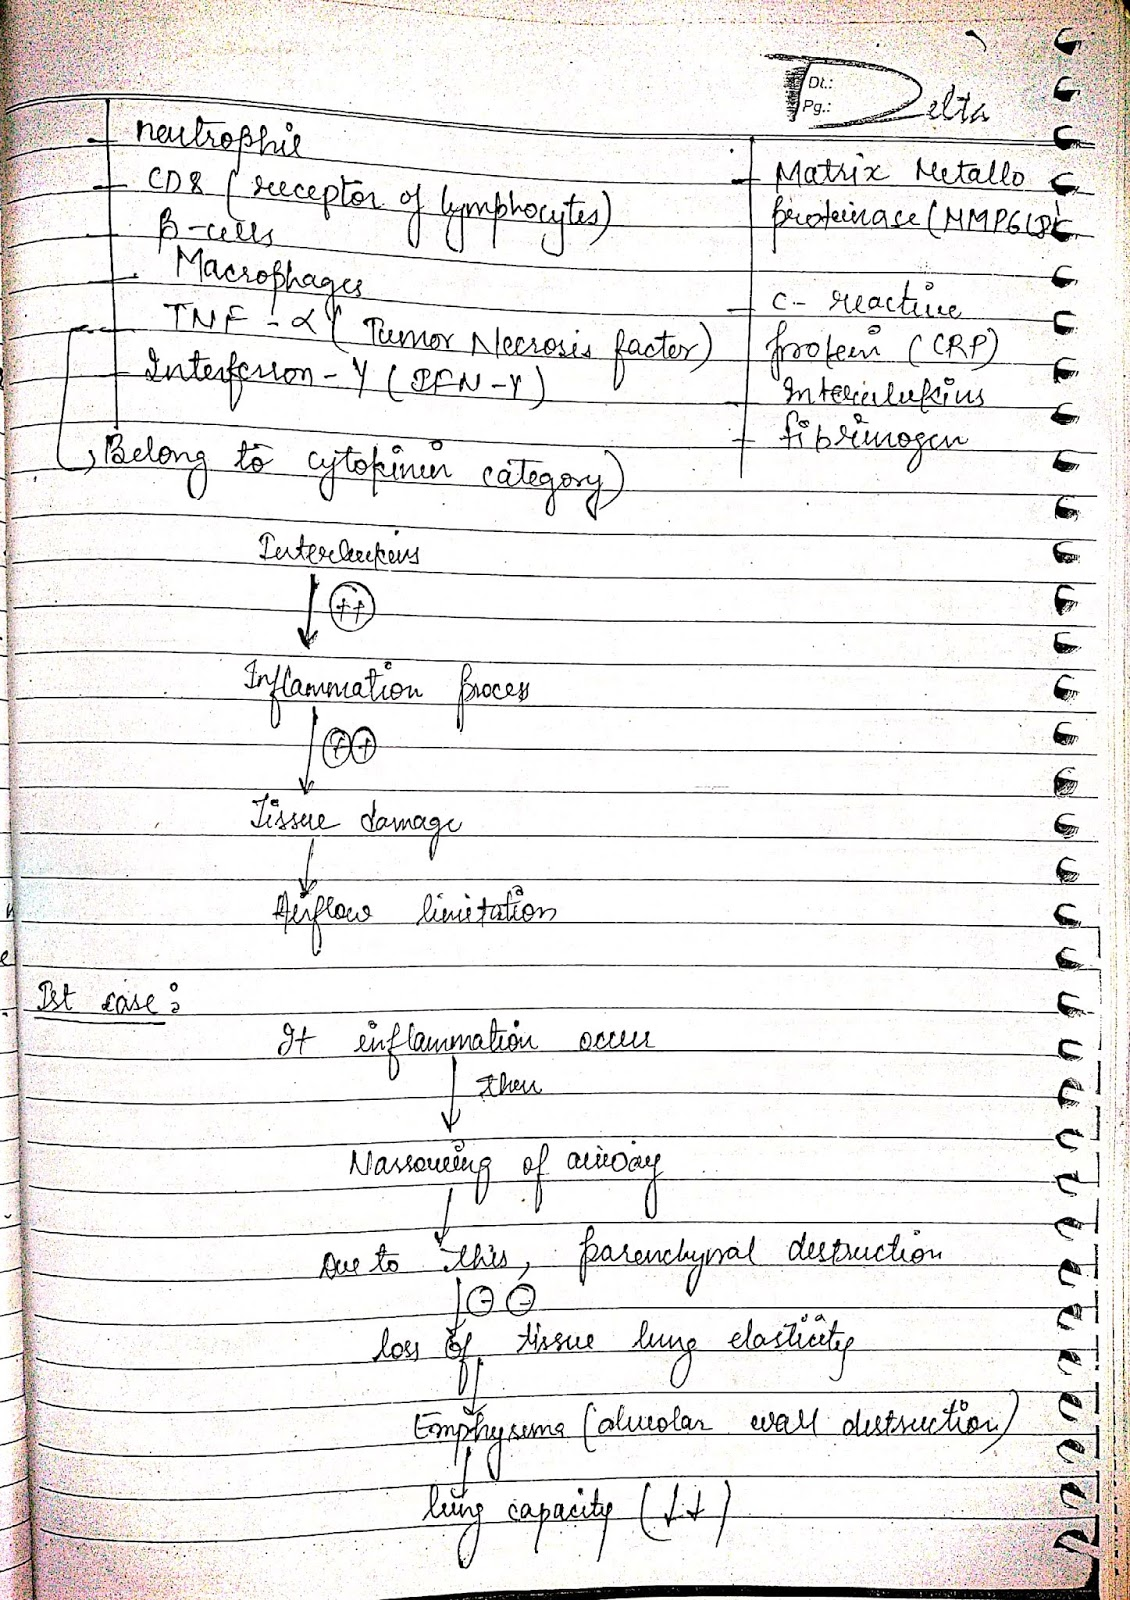 pathophysiology - chronic orstructive pulmonary diseases, copd, coad, cord, cold